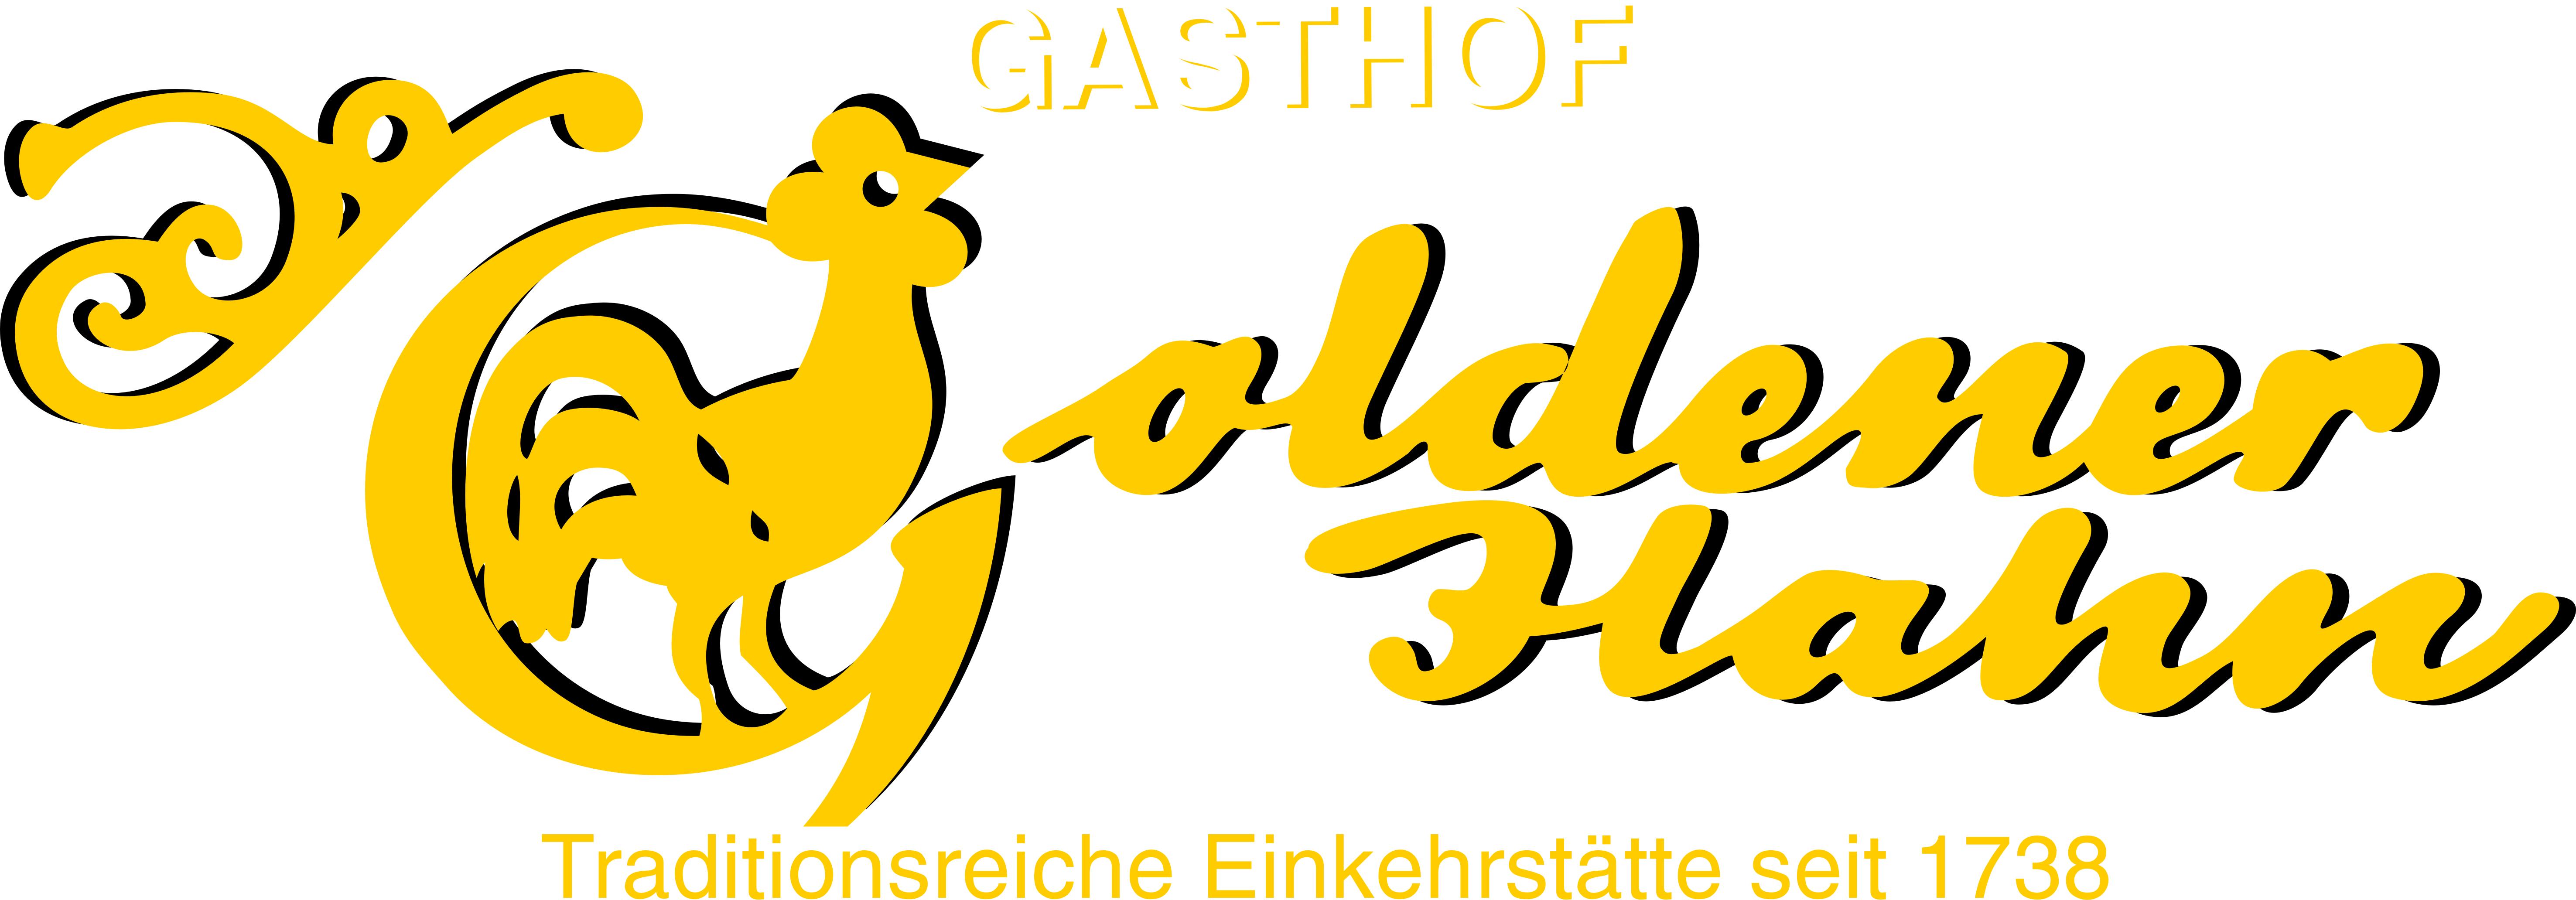 Goldener Hahn Chemnitz